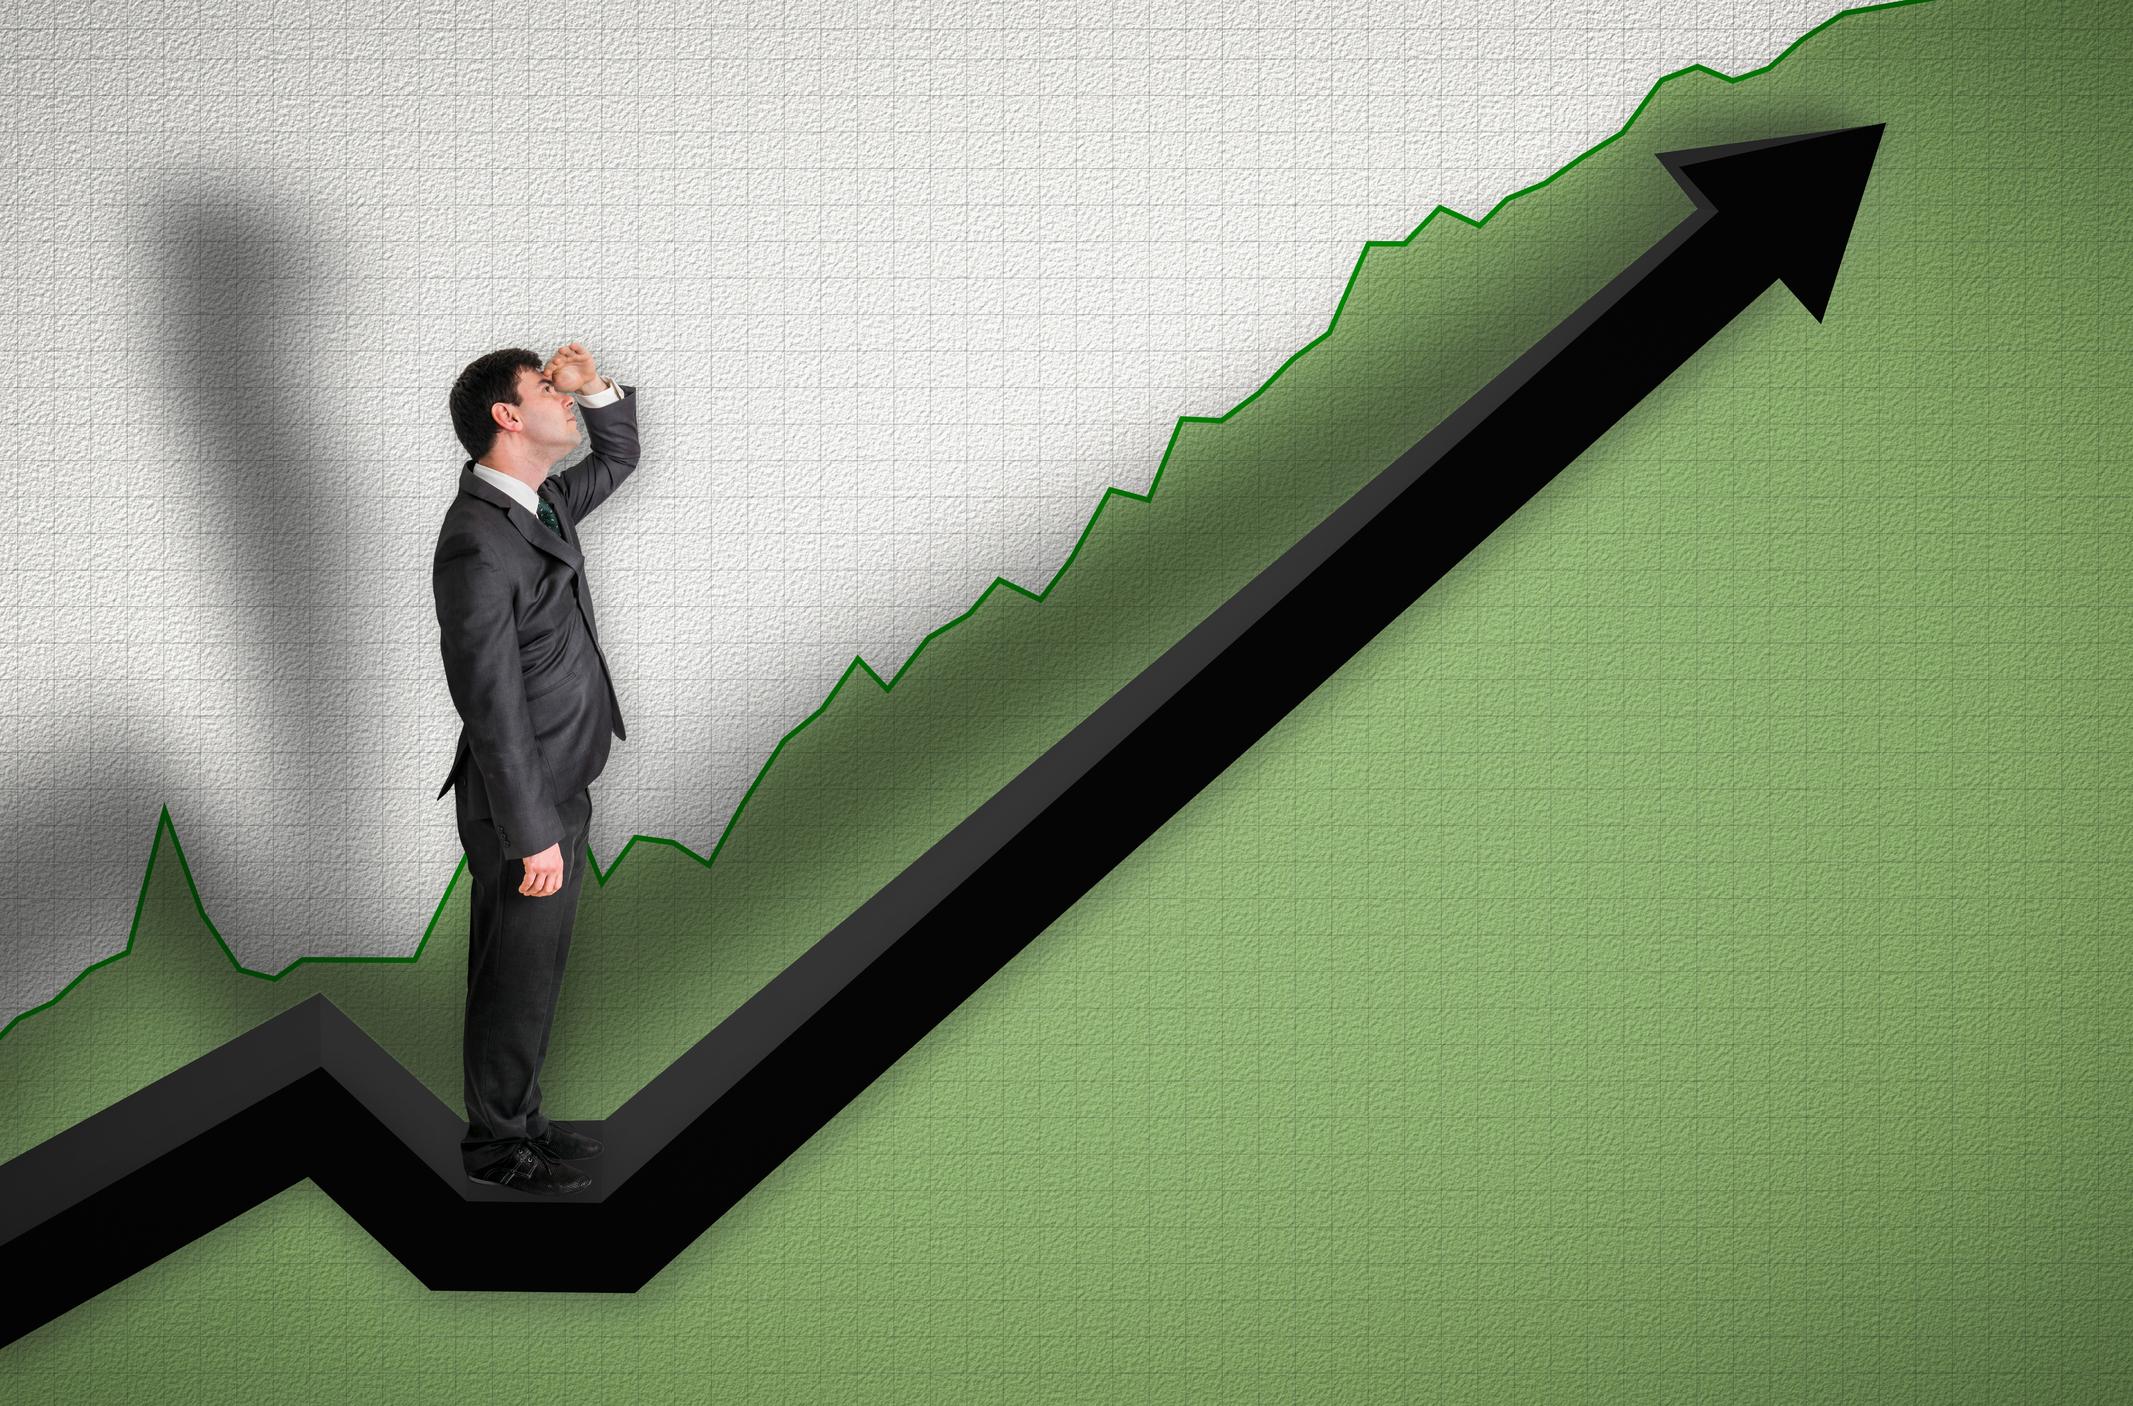 Businessman watching chart go up